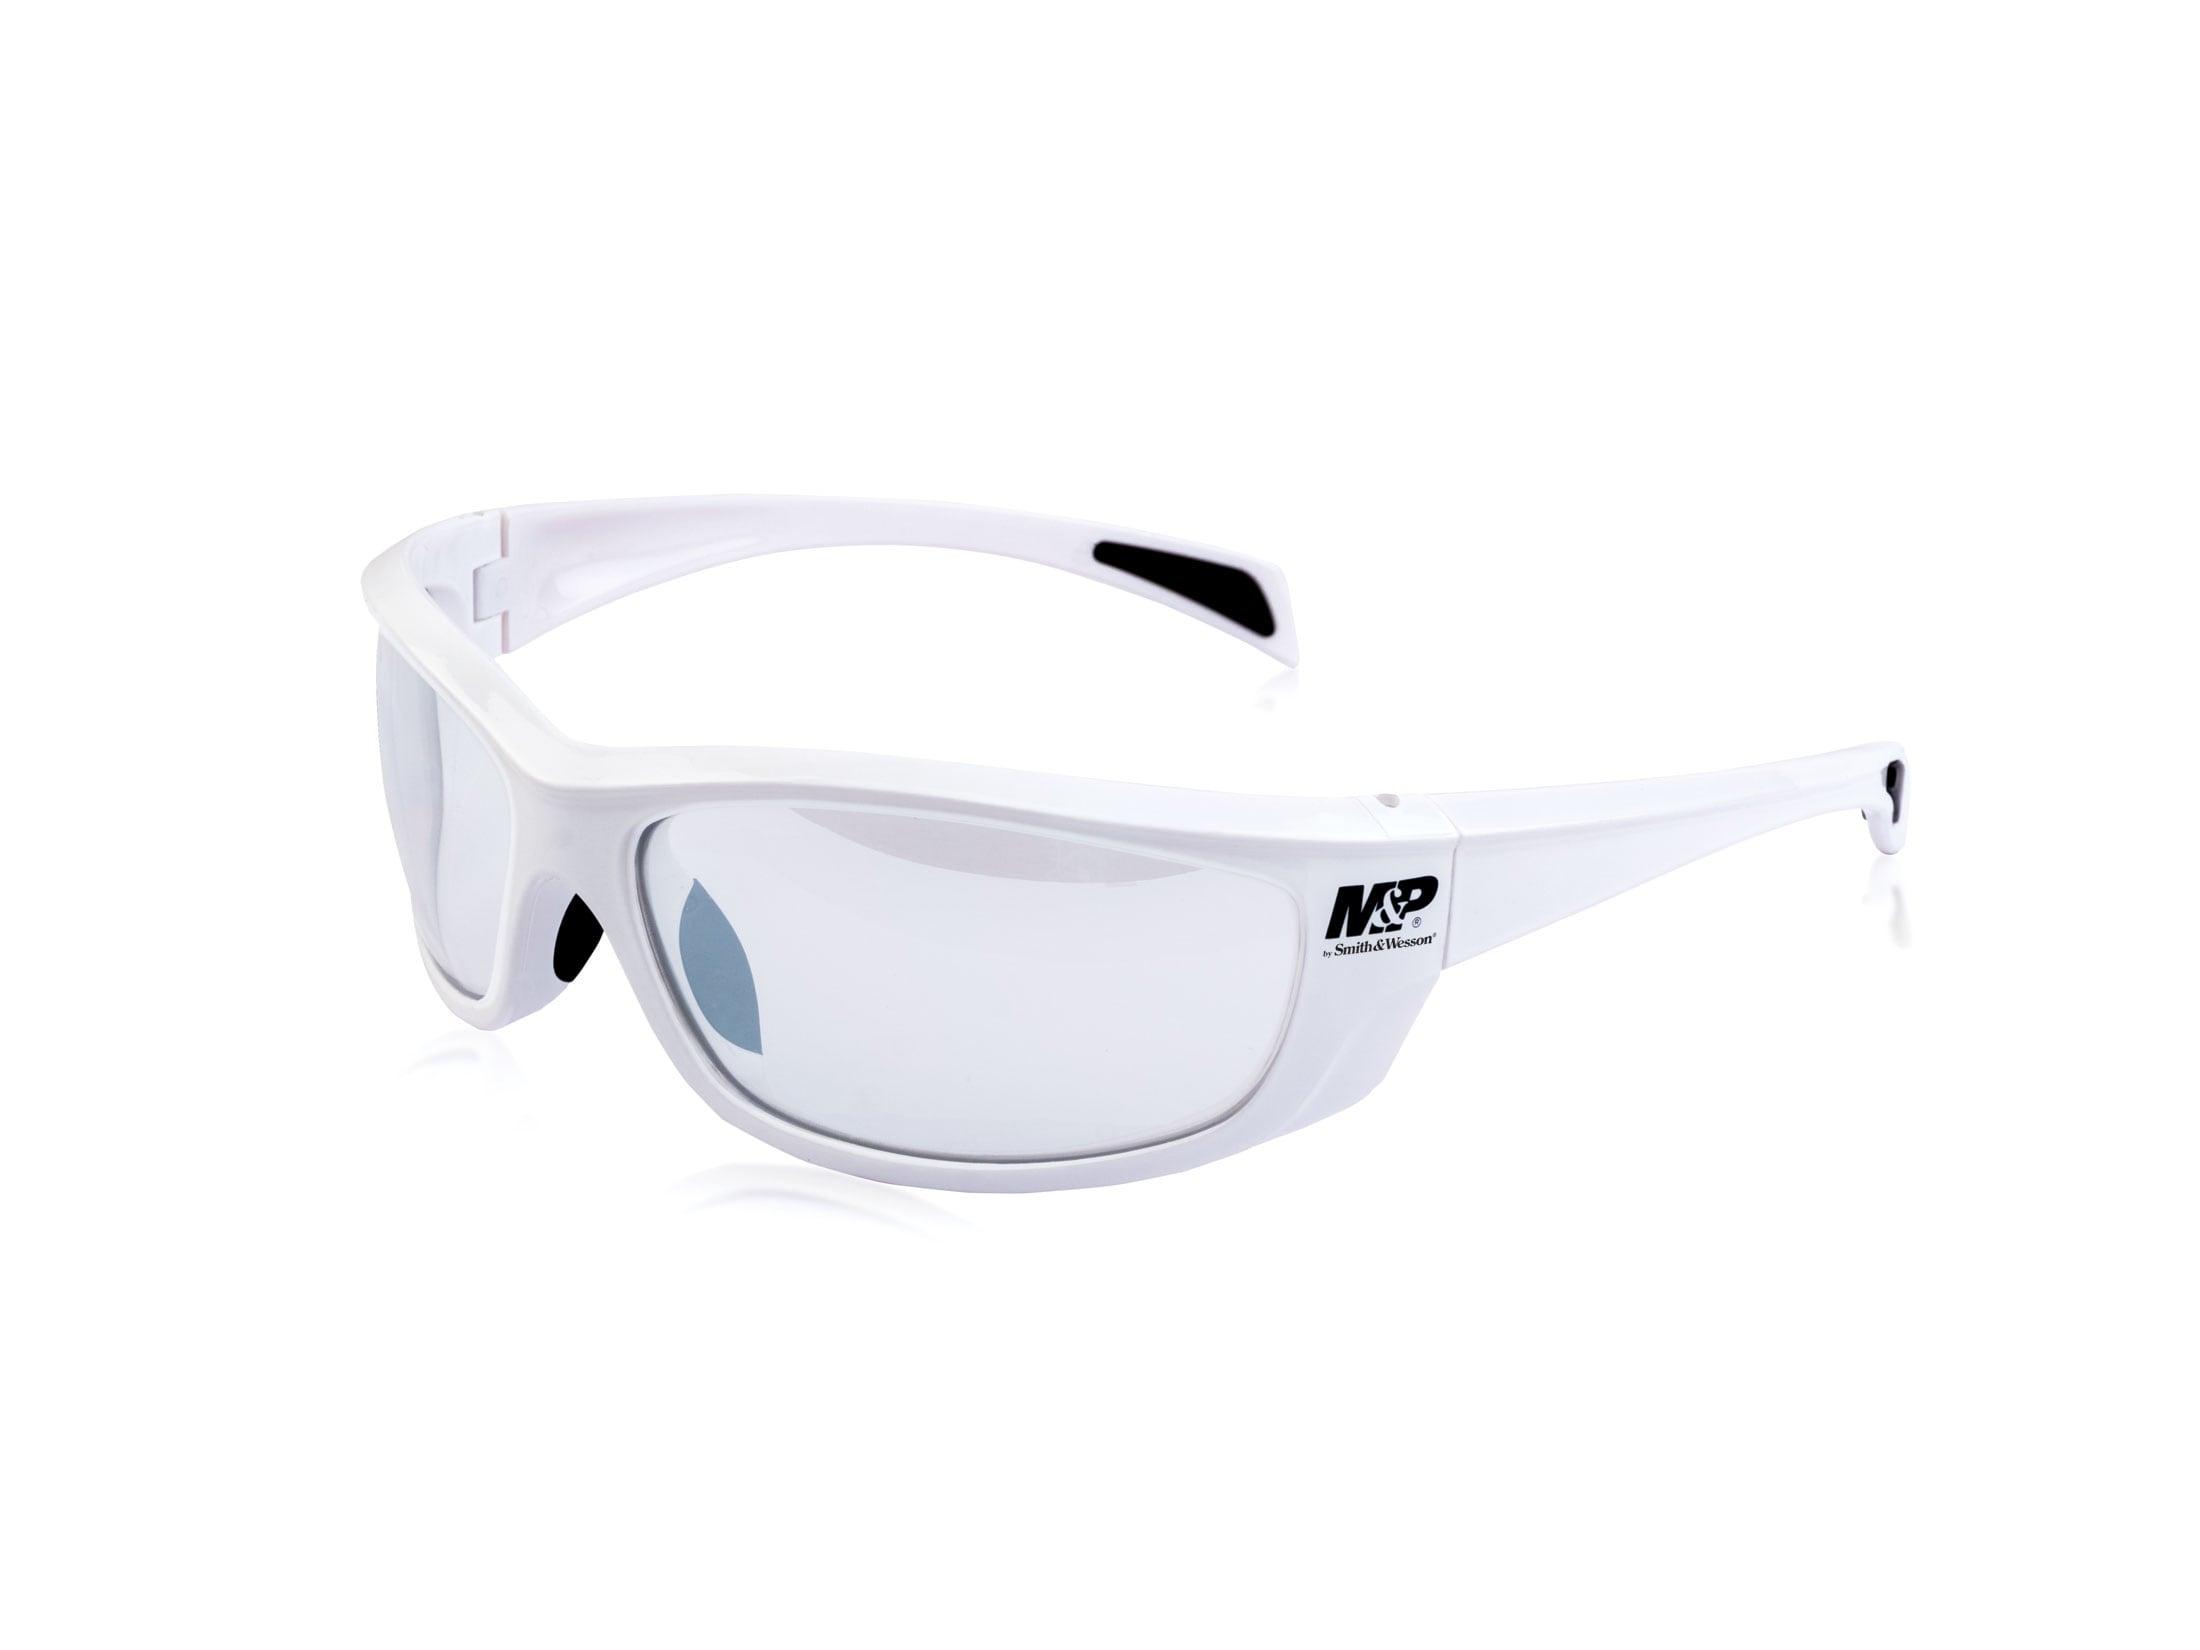 Smith & Wesson M&P Whitehawk Shooting Glasses White Frame Blue Mirror